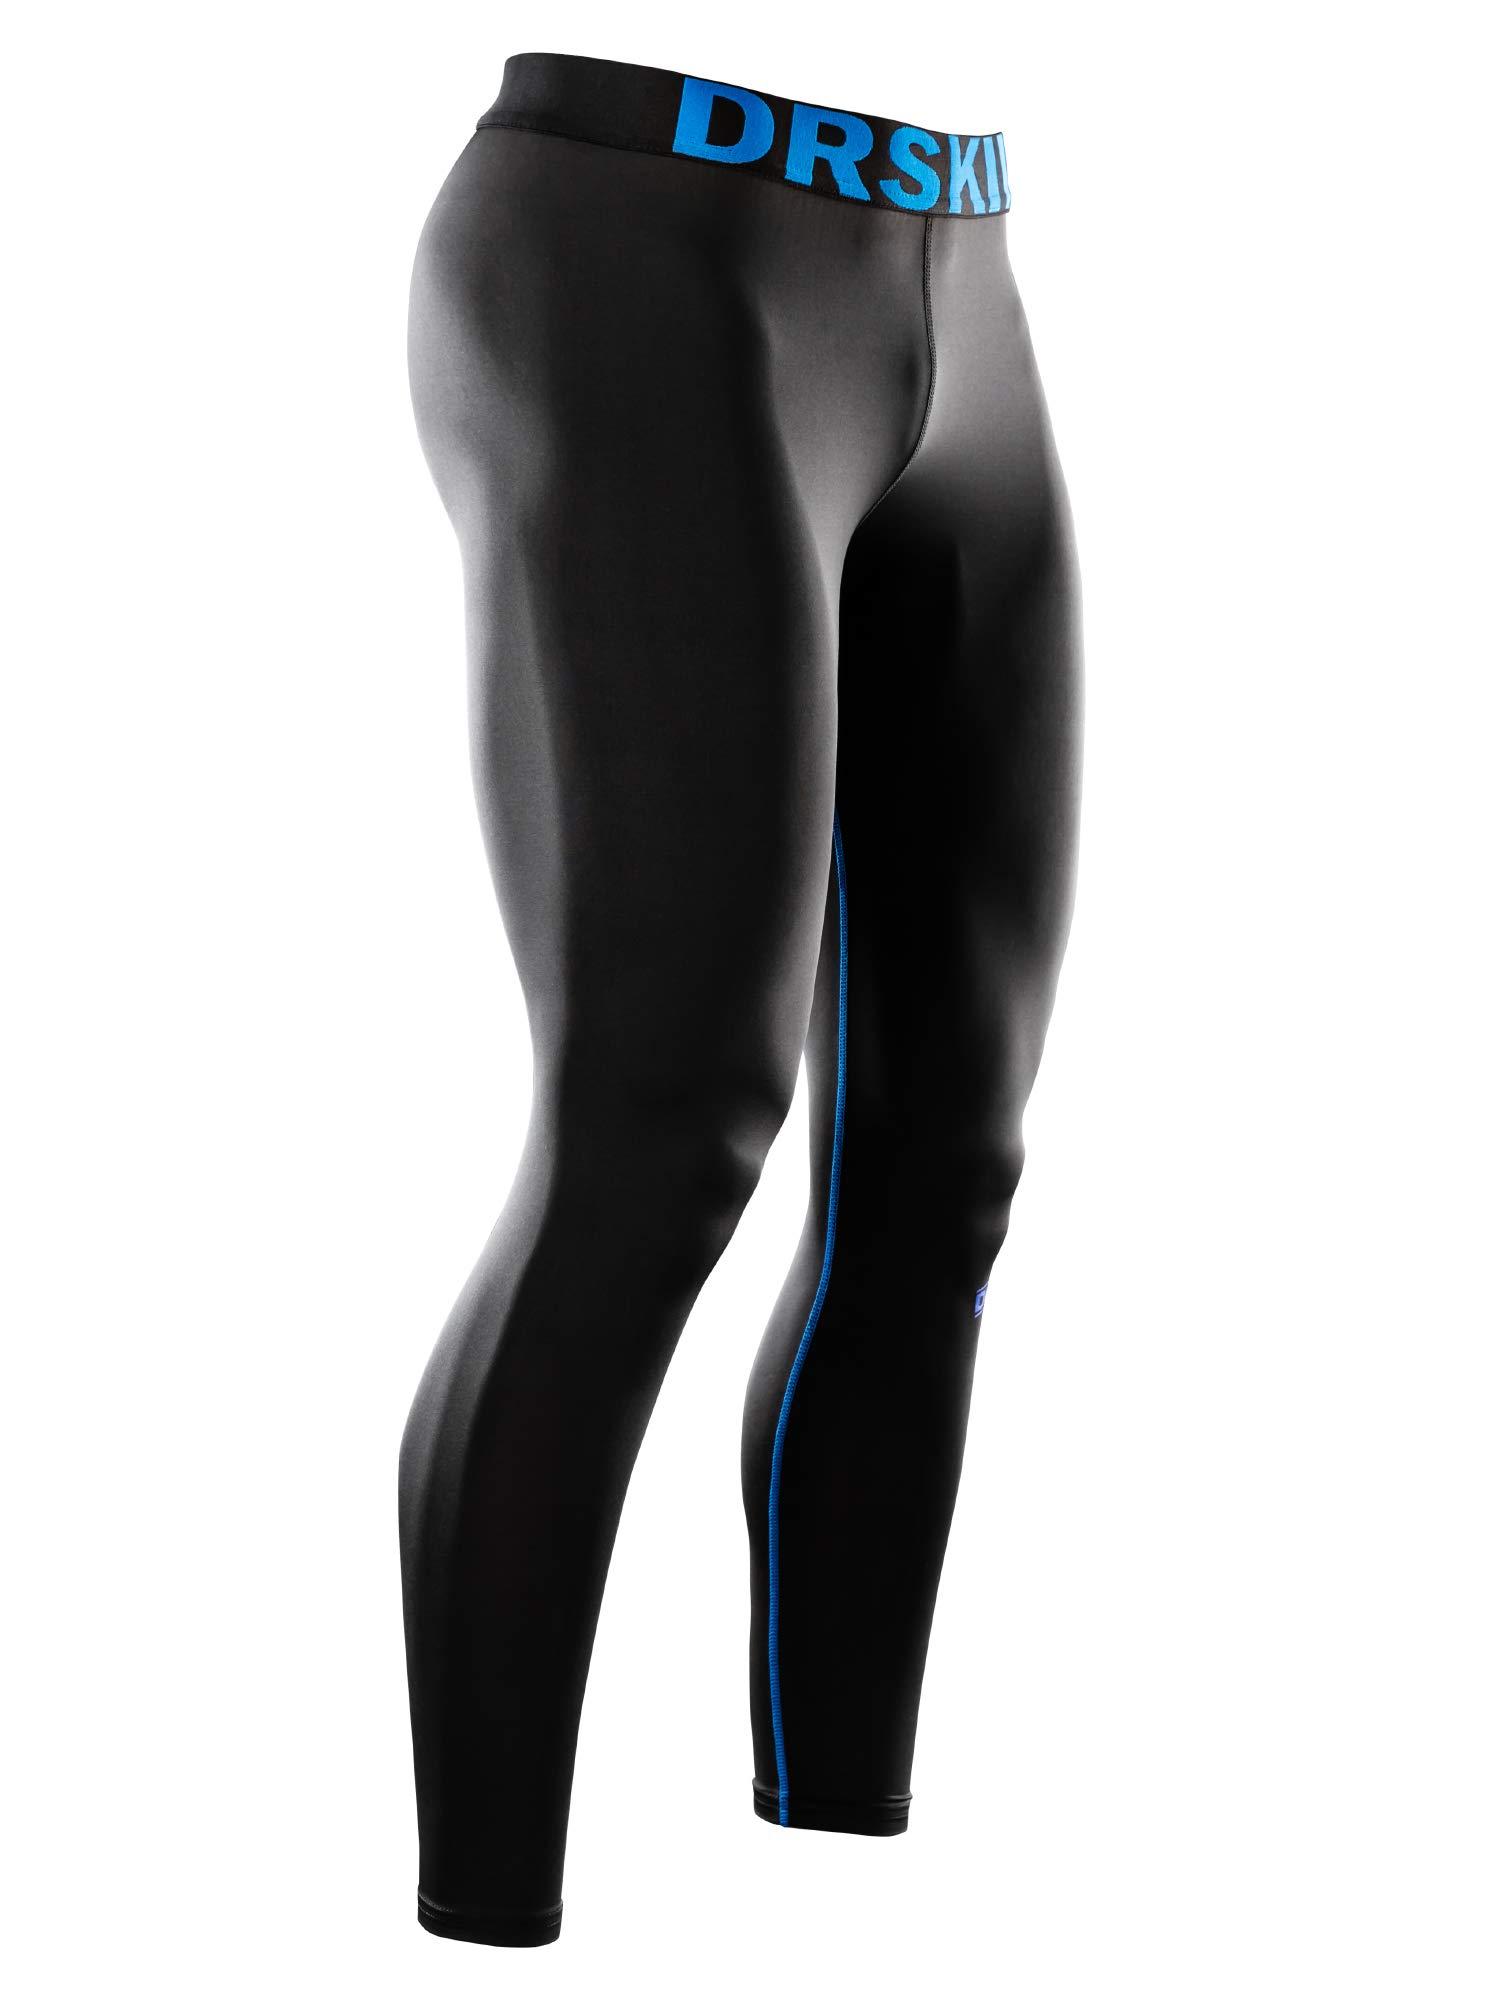 DRSKIN Compression Cool Dry Sports Tights Pants Baselayer Running Leggings Yoga Rashguard Men (Simple BU-BU16, XL) by DRSKIN